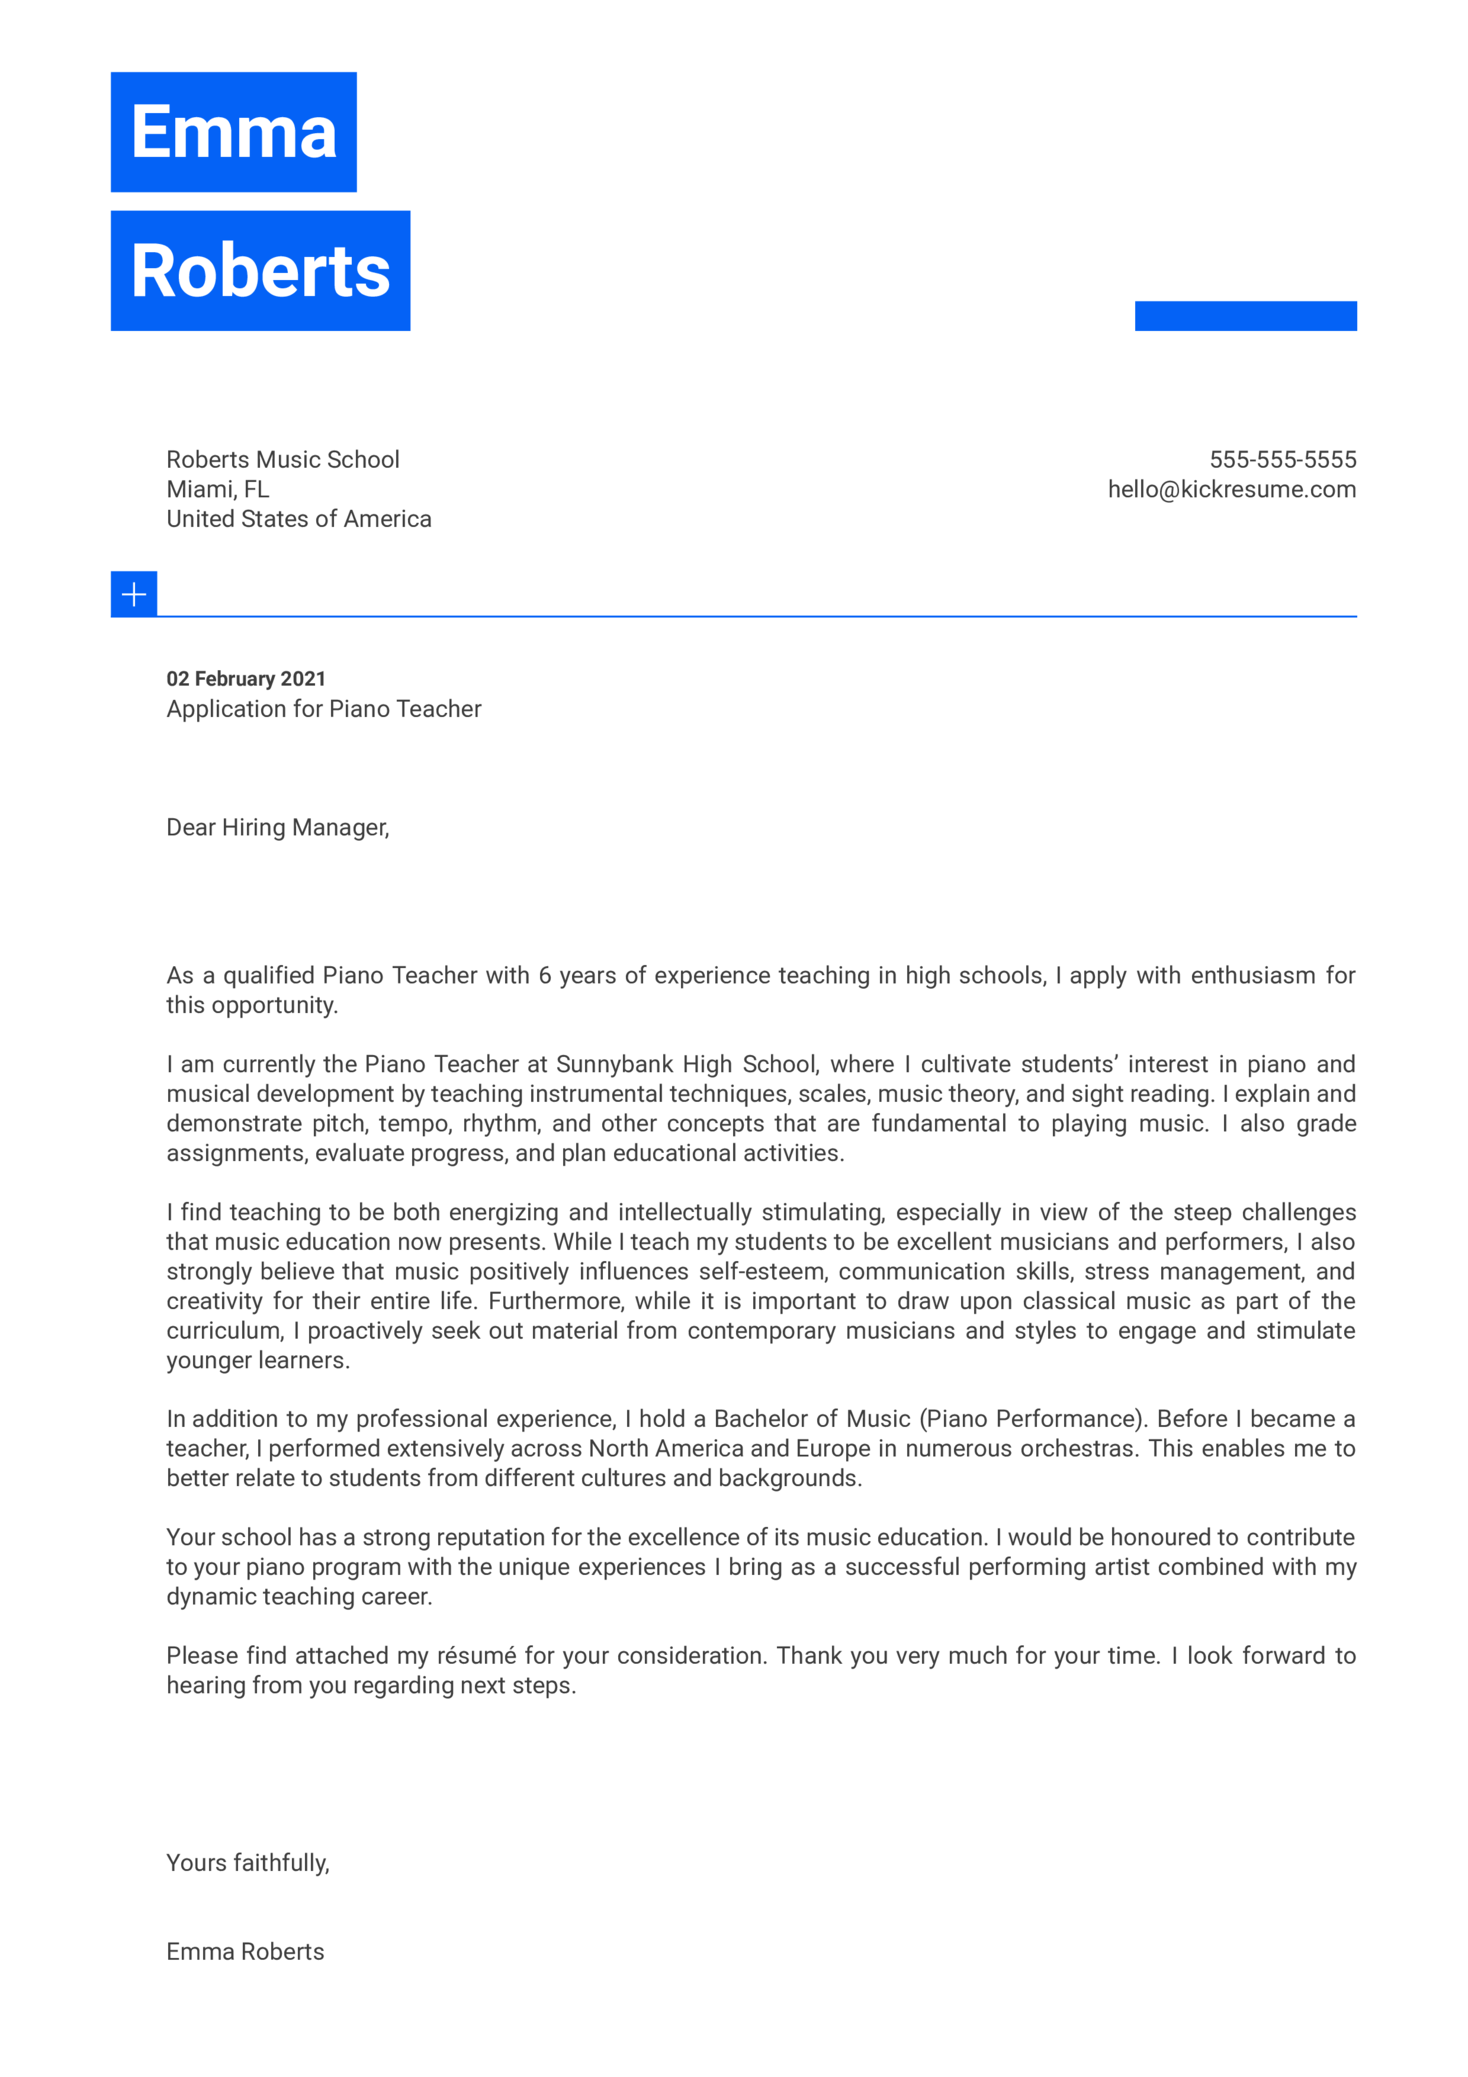 Piano Teacher Cover Letter Template